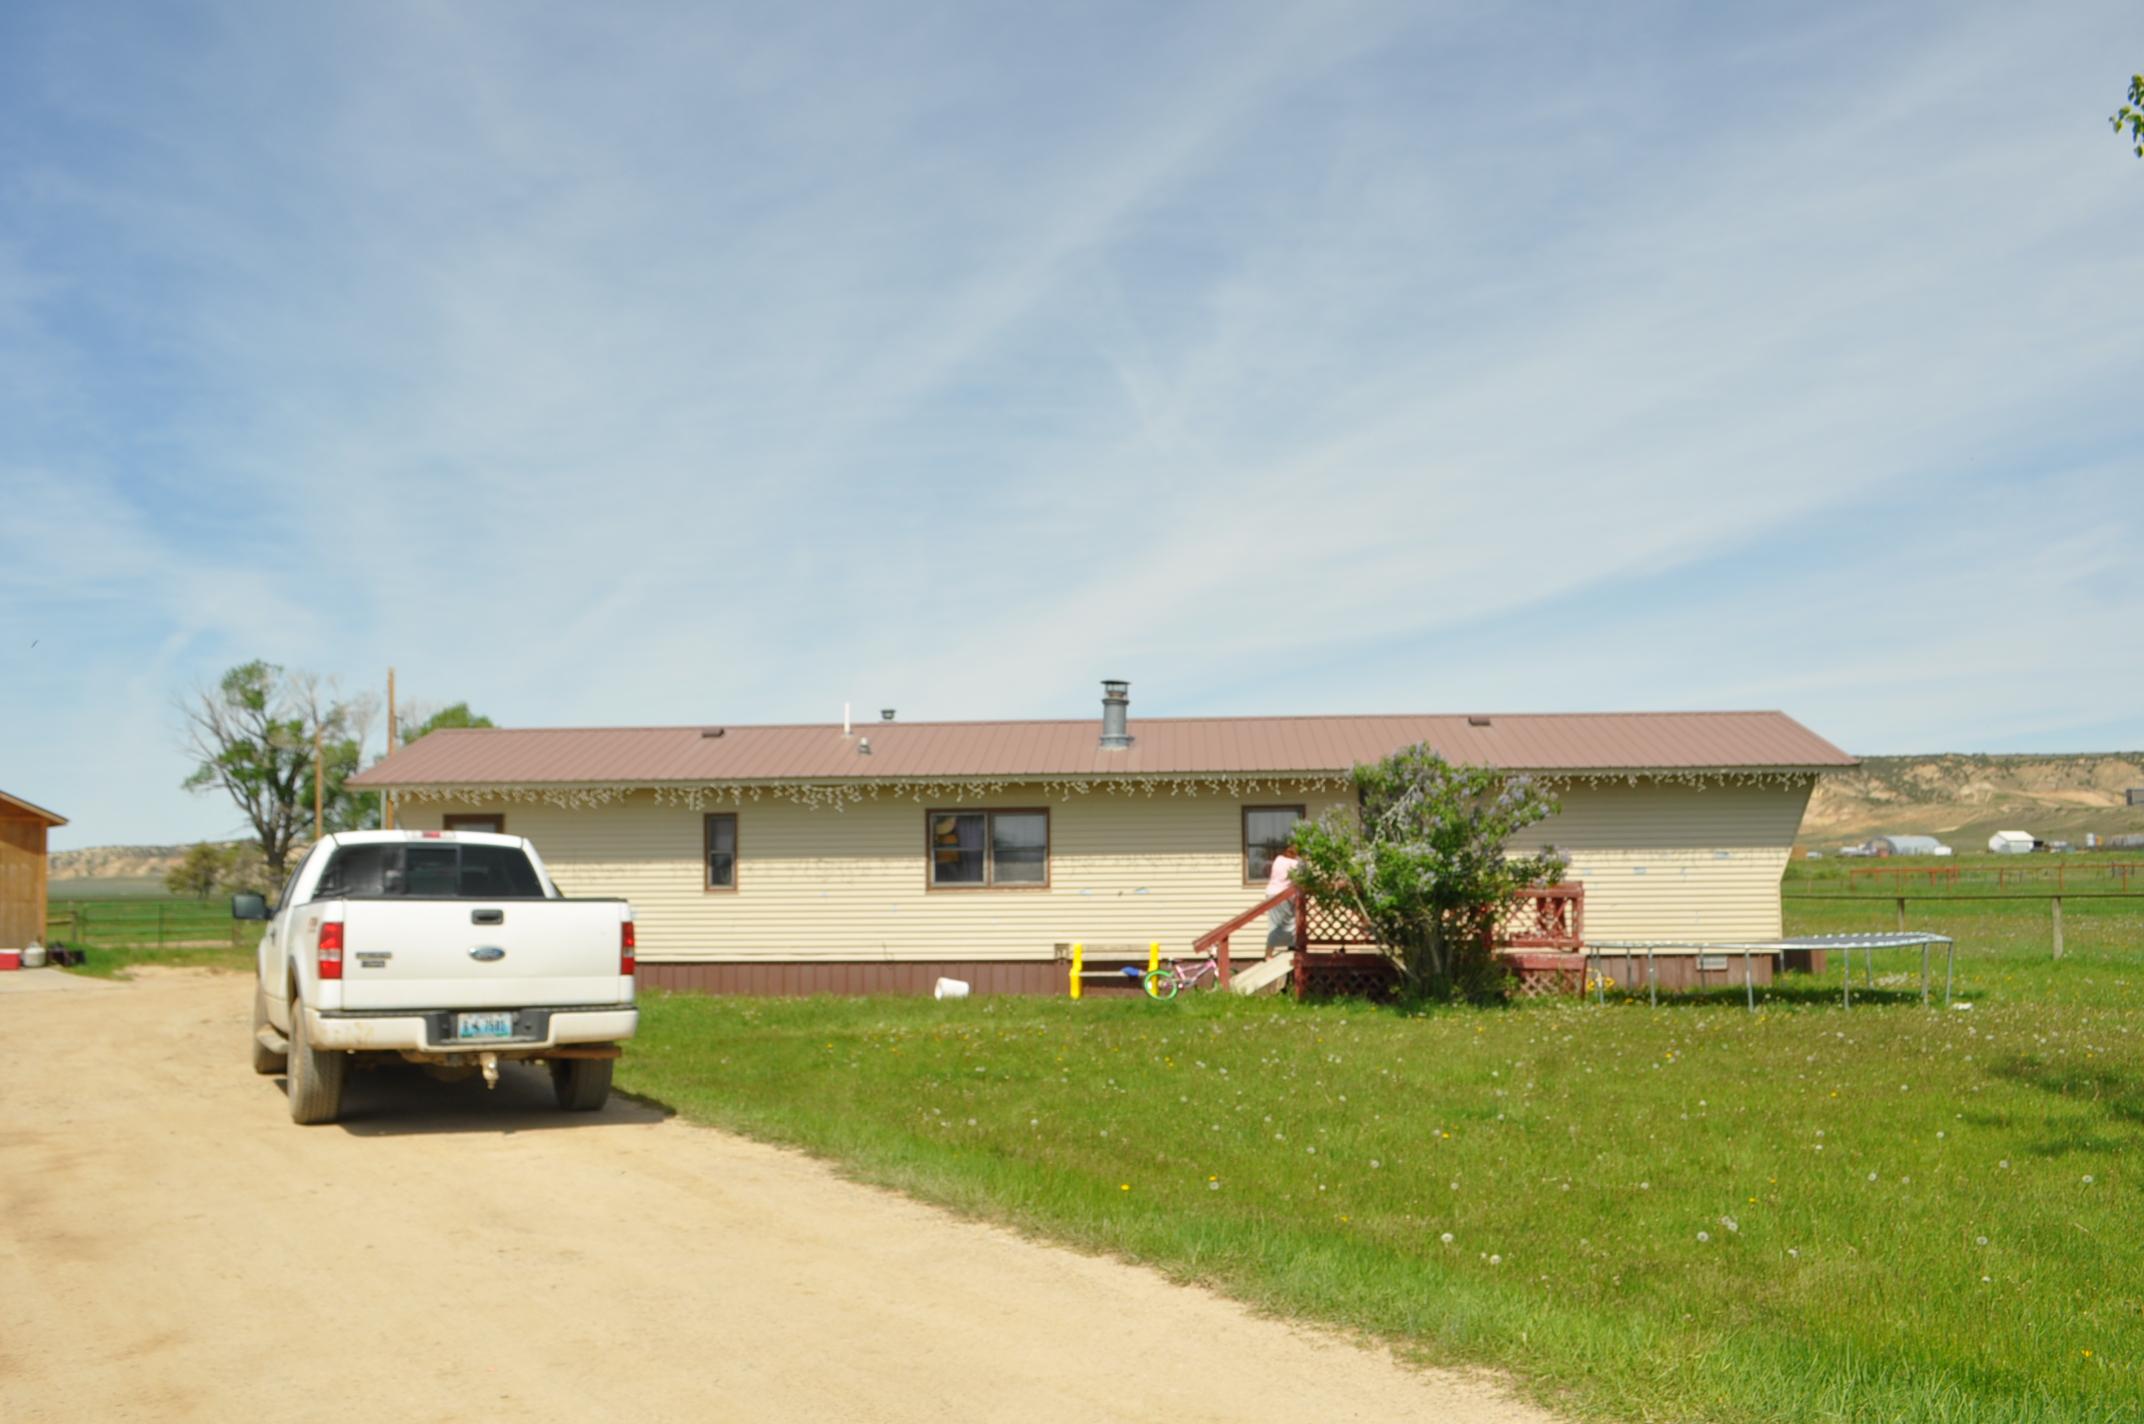 52 Cowpoke, Baggs, Wyoming 82321